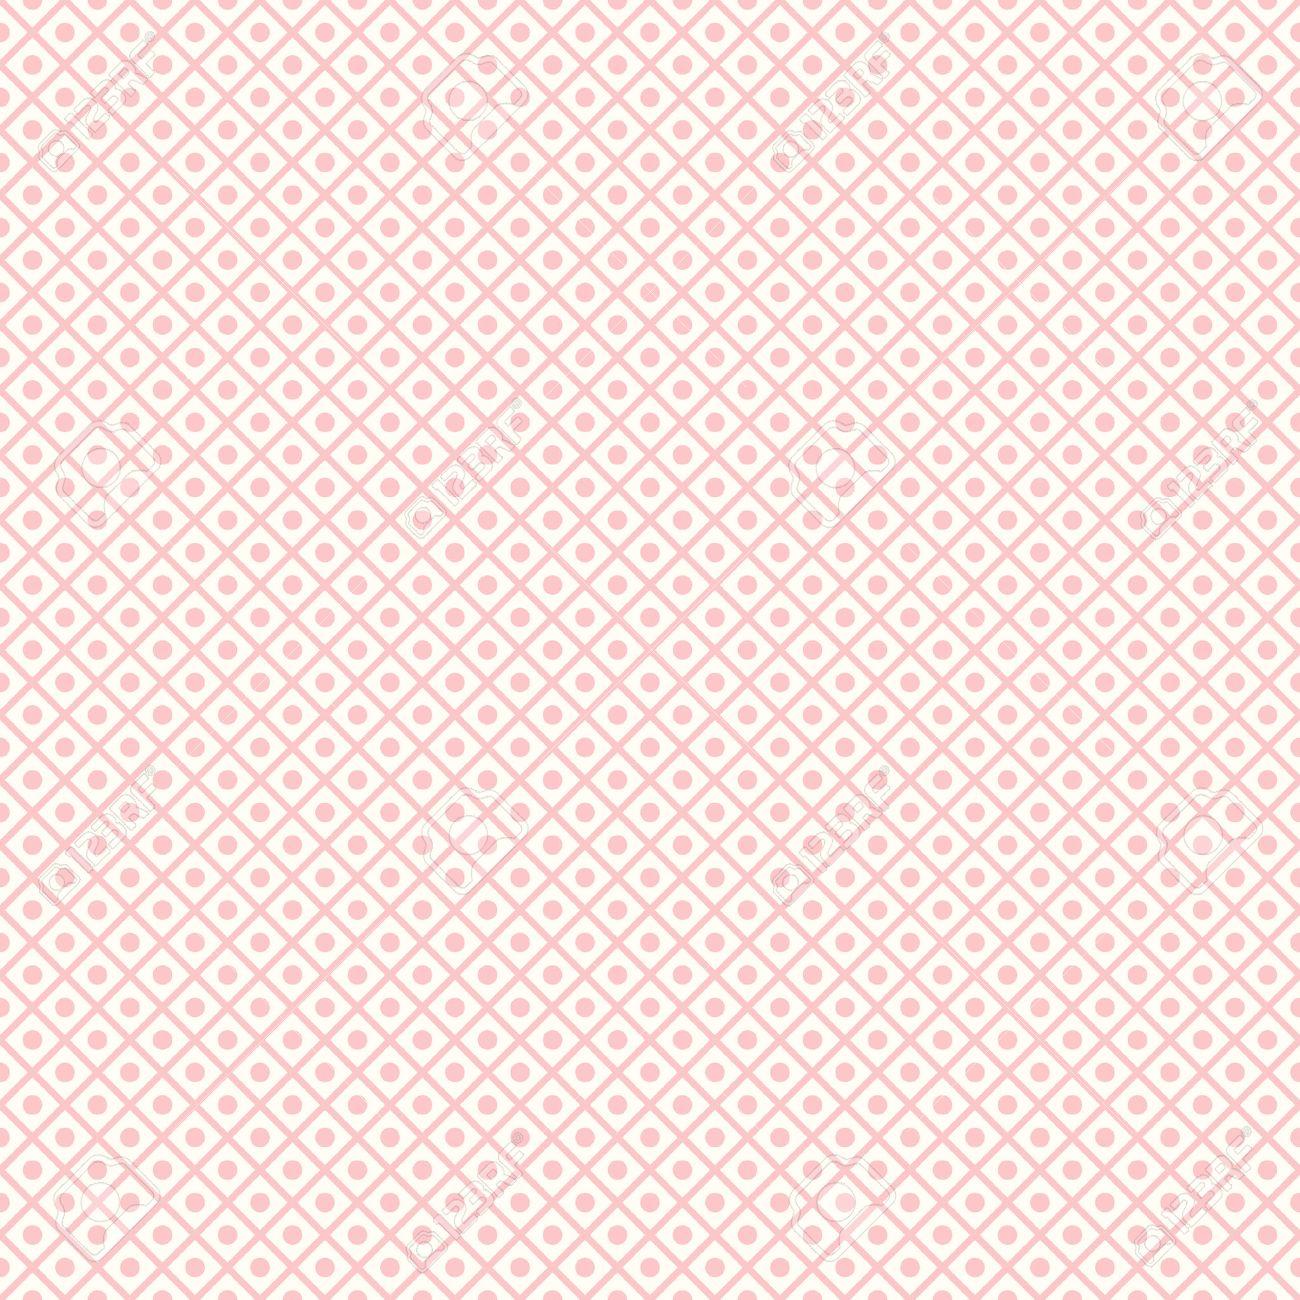 Pastell Retro Vektor Nahtlose Muster Fliesen Endless Textur Kann Fur